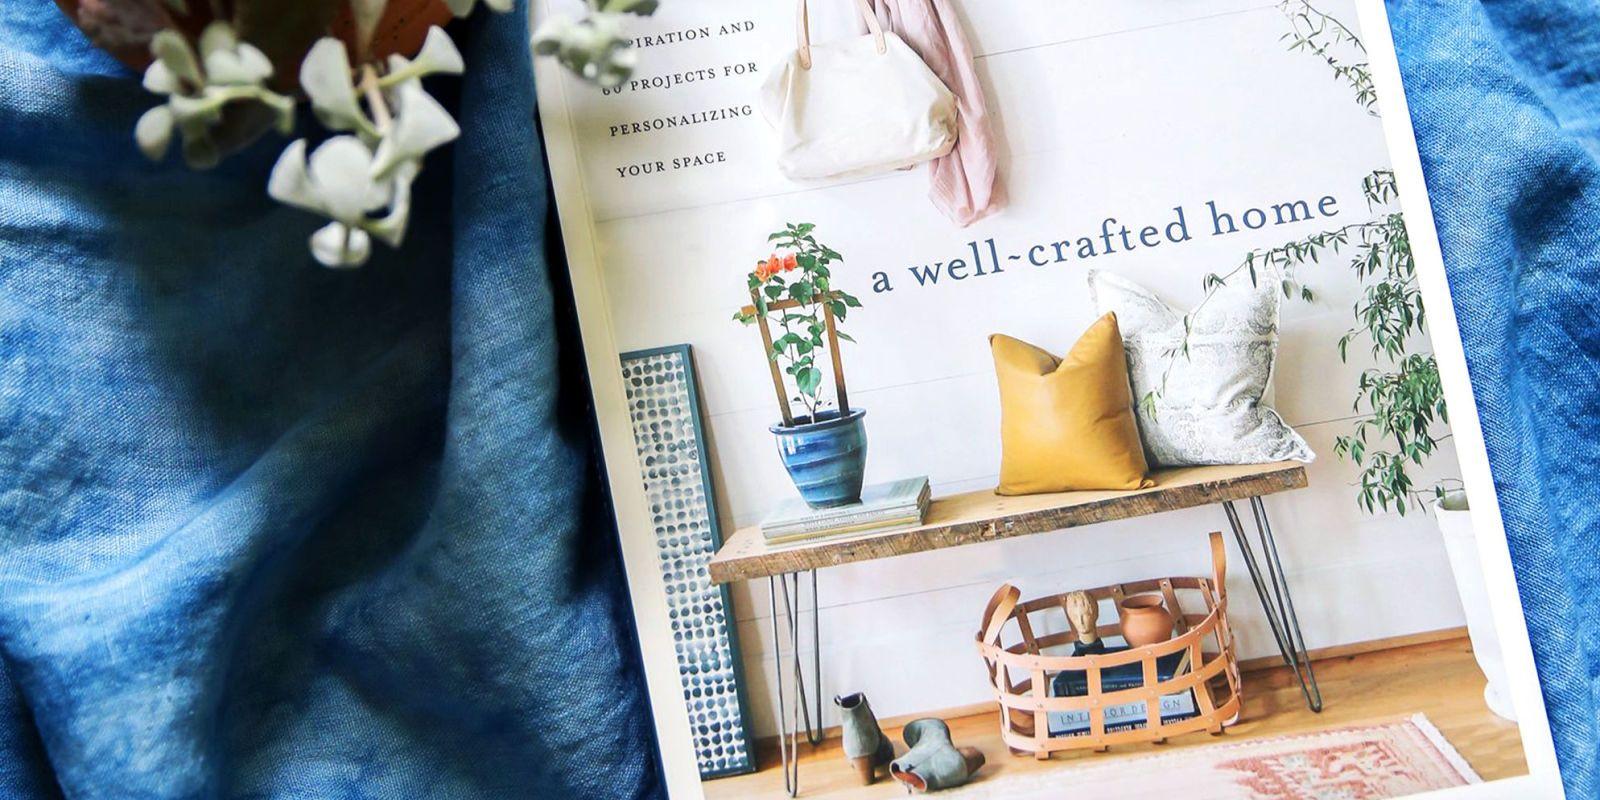 18 Best Interior Design Books of 2018 Top Books for Home Decor Ideas